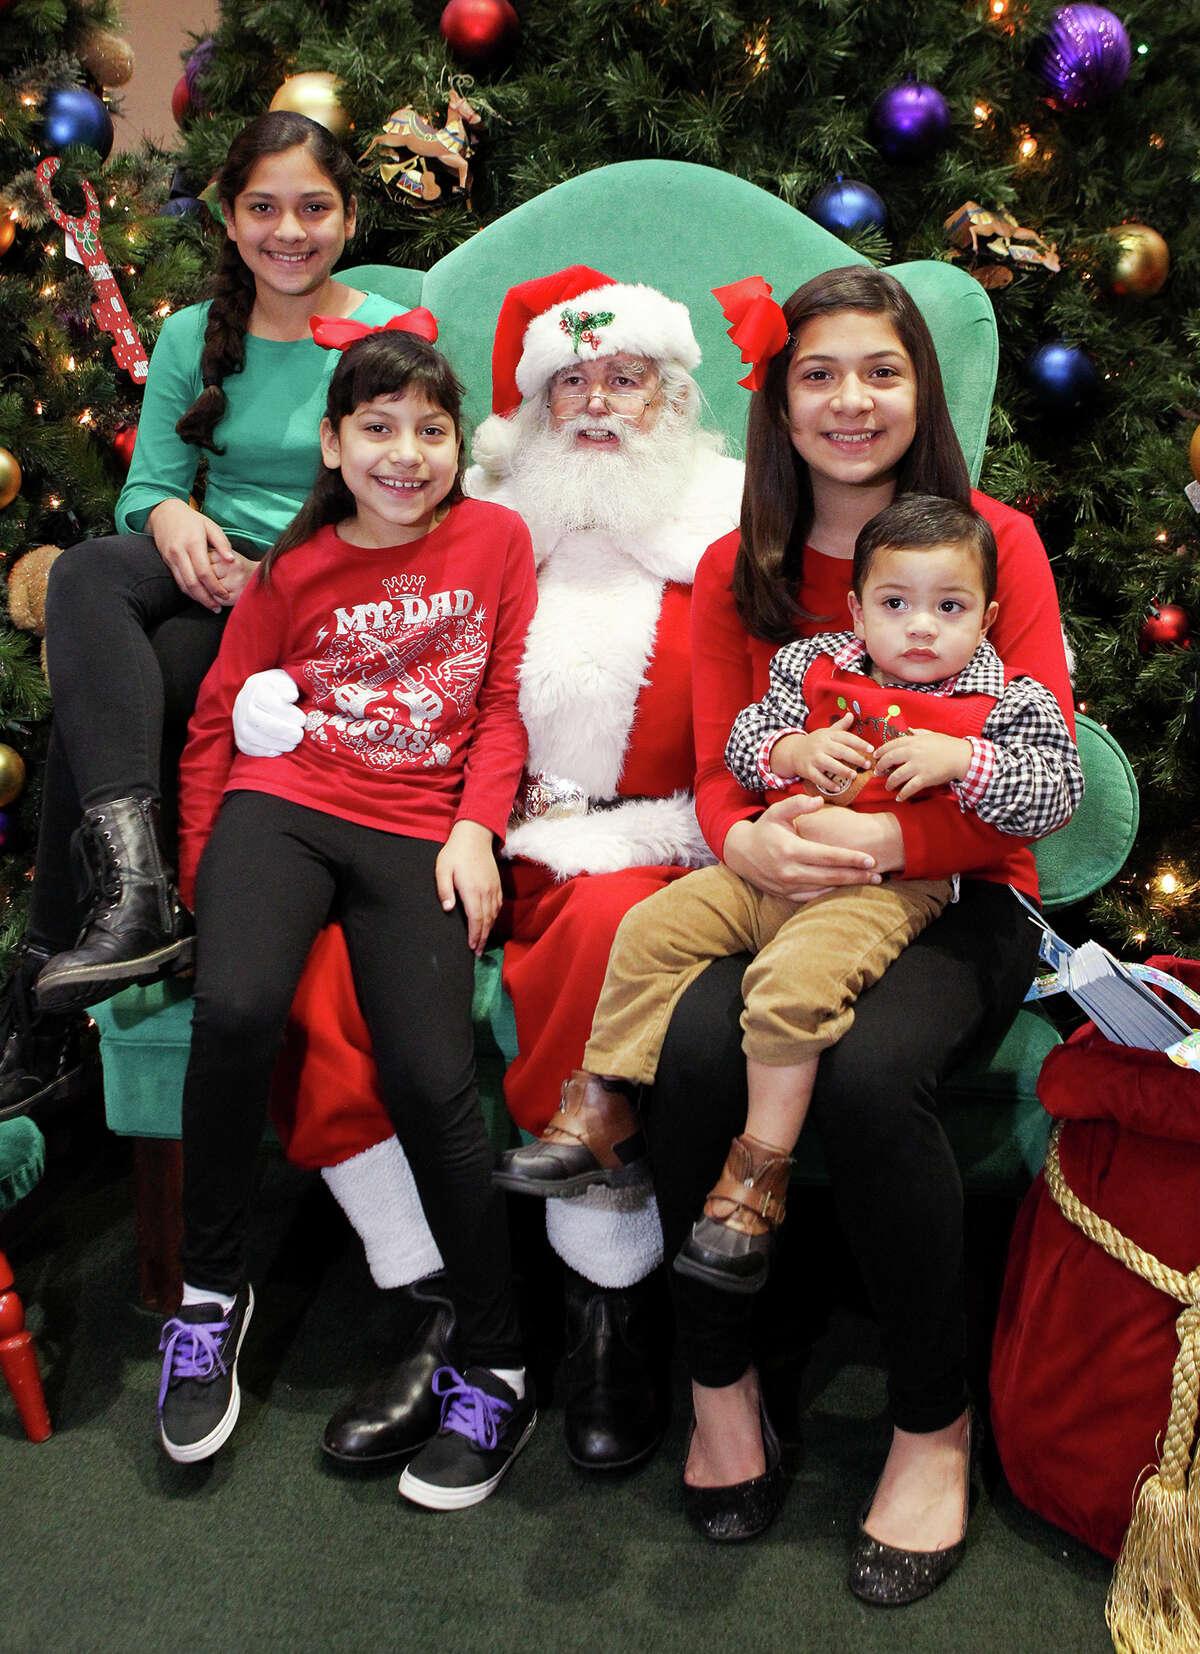 Marisa Berrelez (from left),12, Elisa Berrelez, 9, Ali Berrelez, 13, and Marcus Berrelez, Jr., 1, visit with Santa - aka Duncan Neville - at South Park Mall on Monday, Dec. 22, 2014. MARVIN PFEIFFER/ mpfeiffer@express-news.net